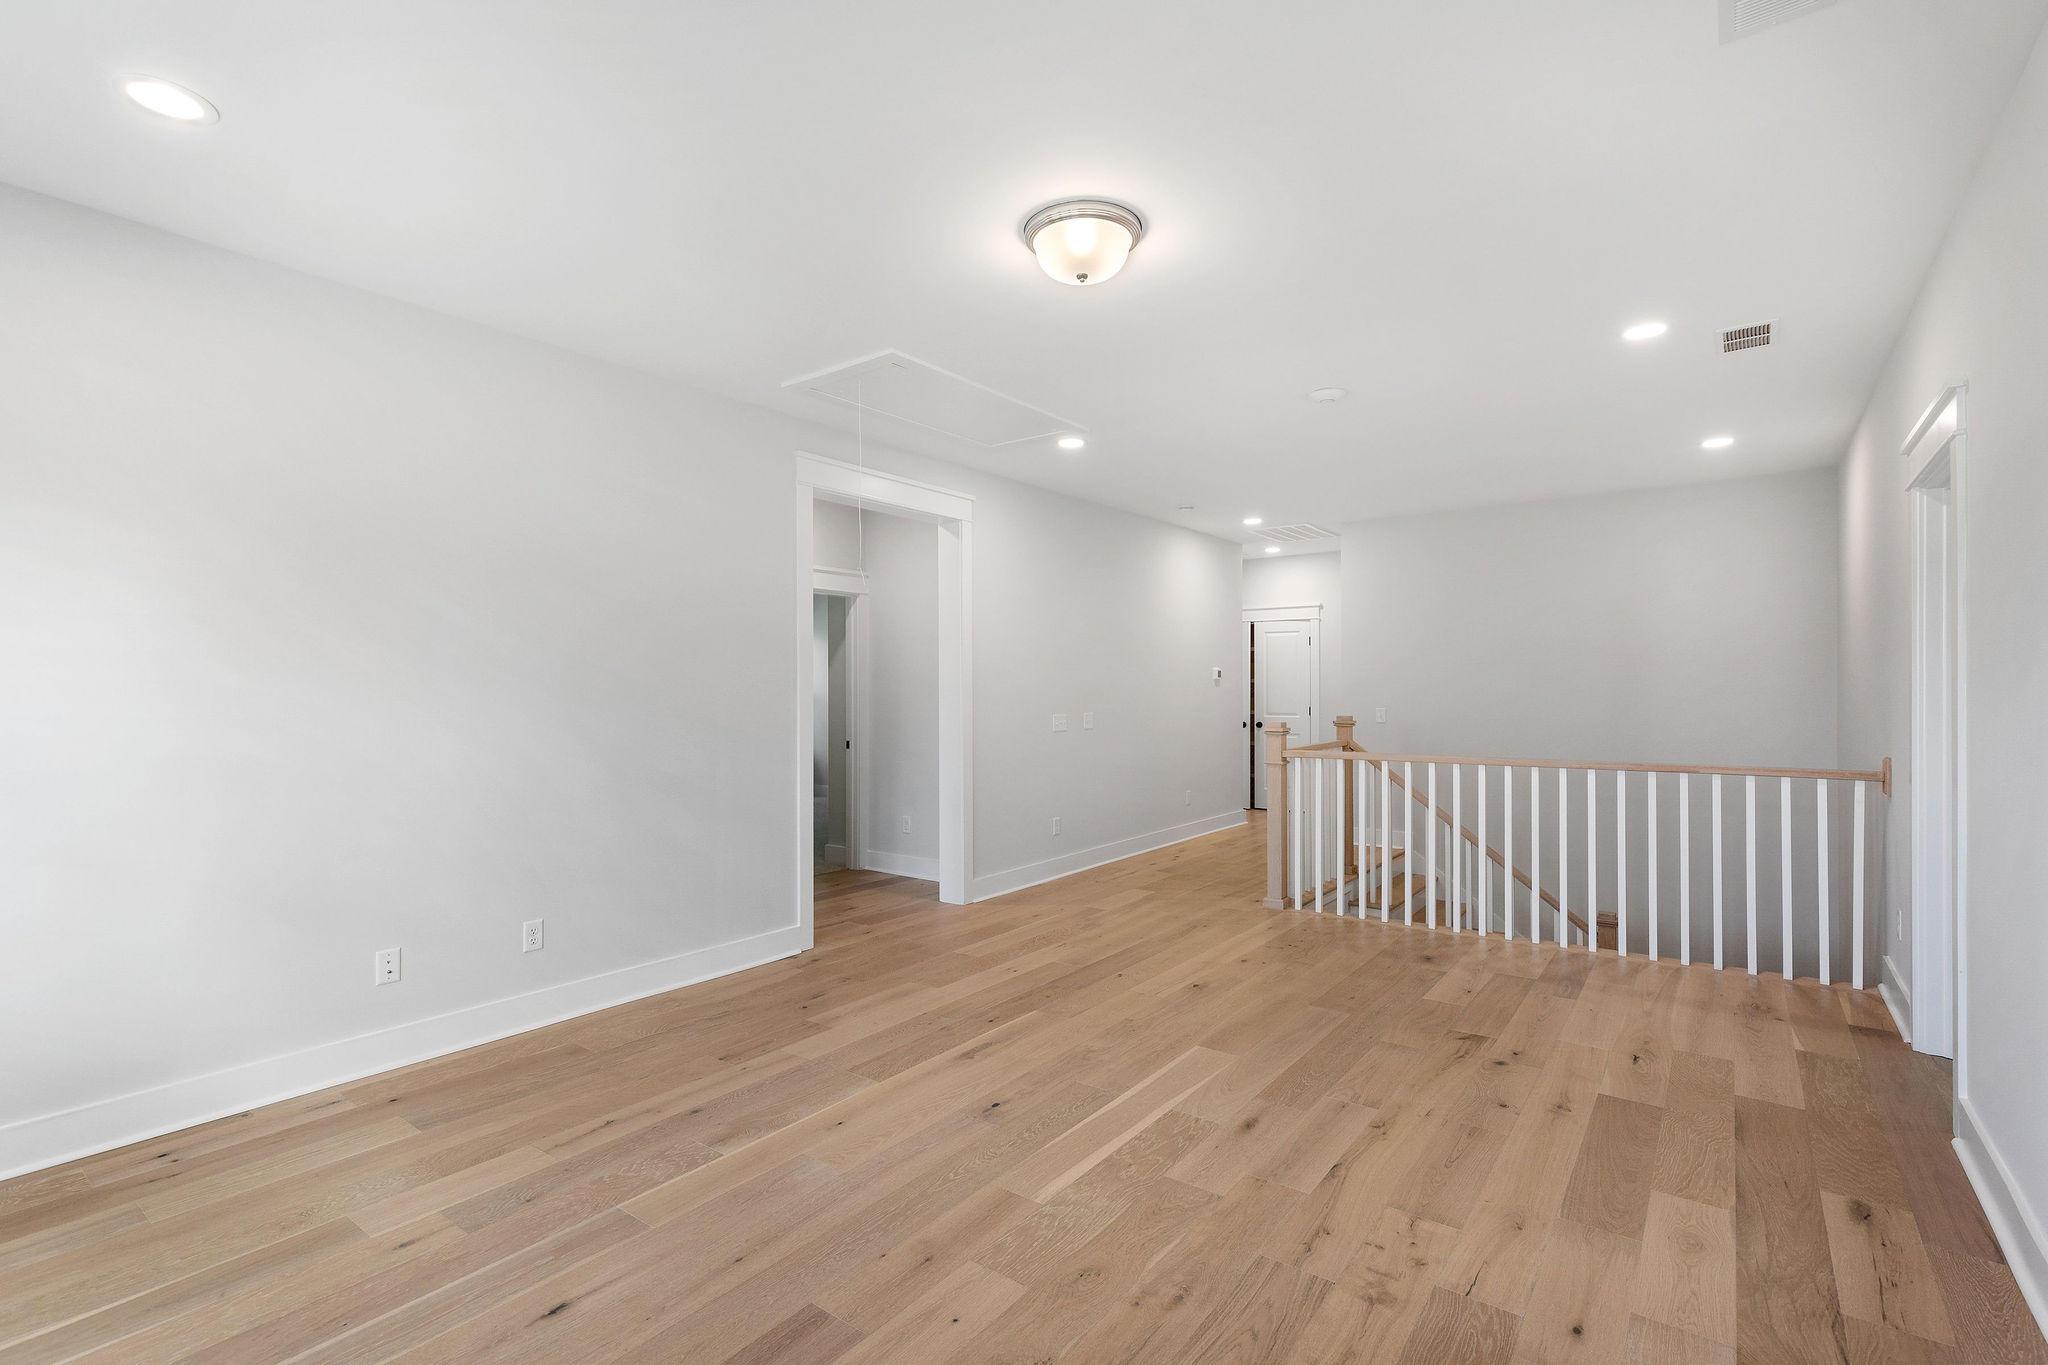 Park West Homes For Sale - 2291 Middlesex, Mount Pleasant, SC - 19